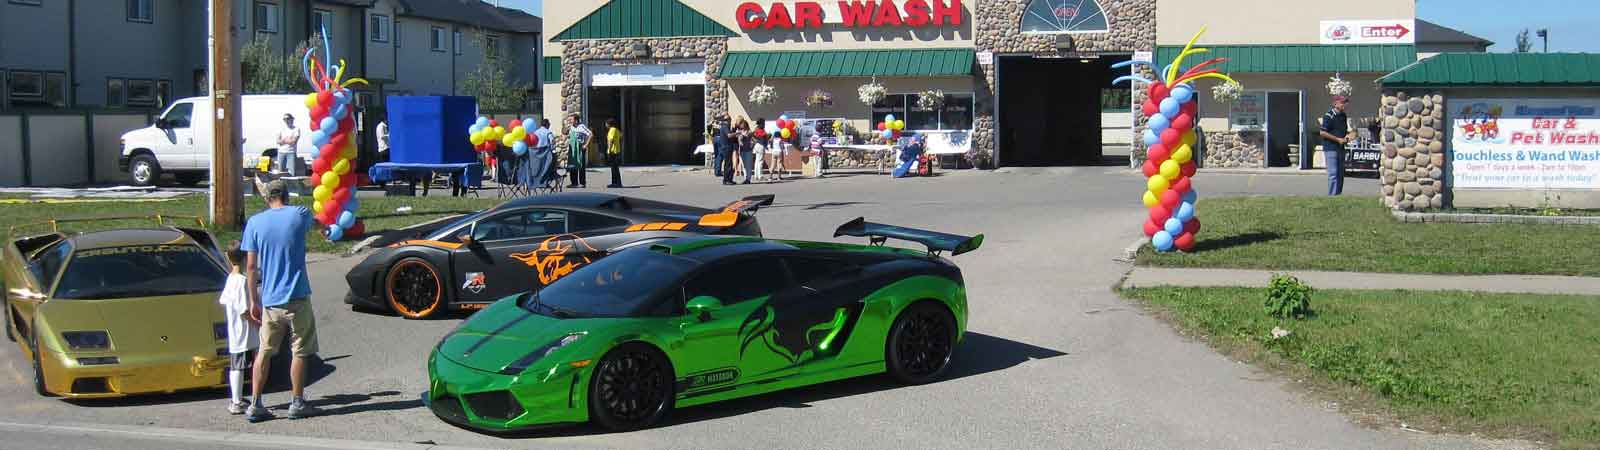 diamond-view-car-wash-front2